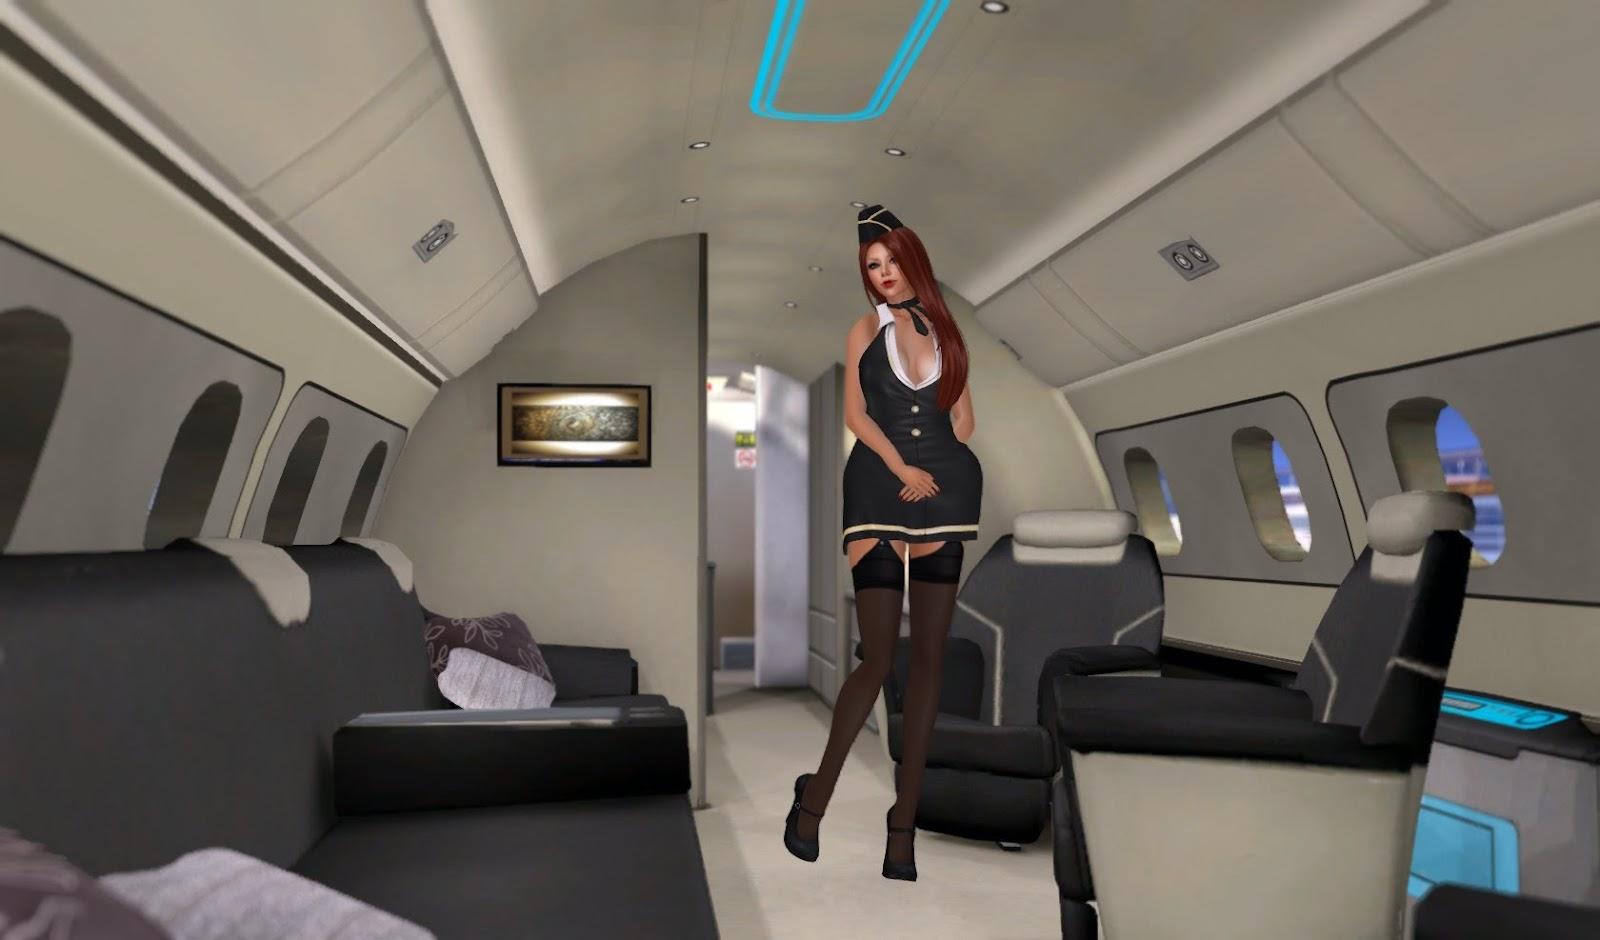 Фото стюардесса ххх, Голые стюардессы - Лучшее фото 4 фотография